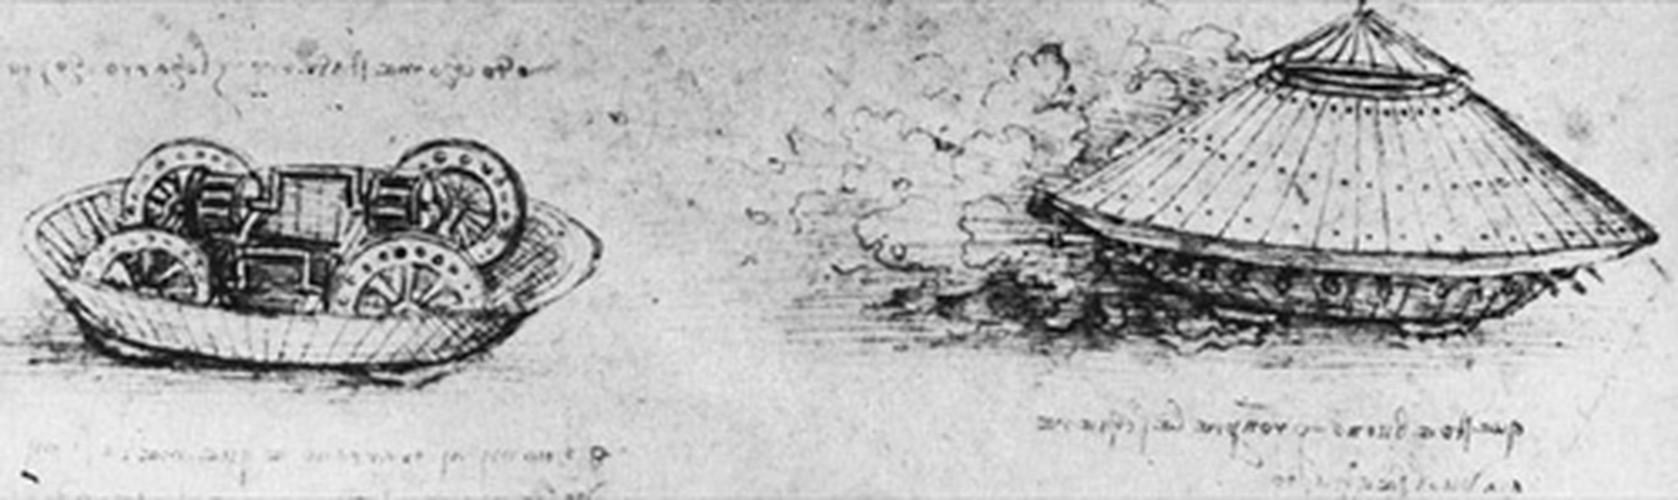 "Giat minh nhung loi ""tien tri"" sam set cua Leonardo da Vinci-Hinh-8"